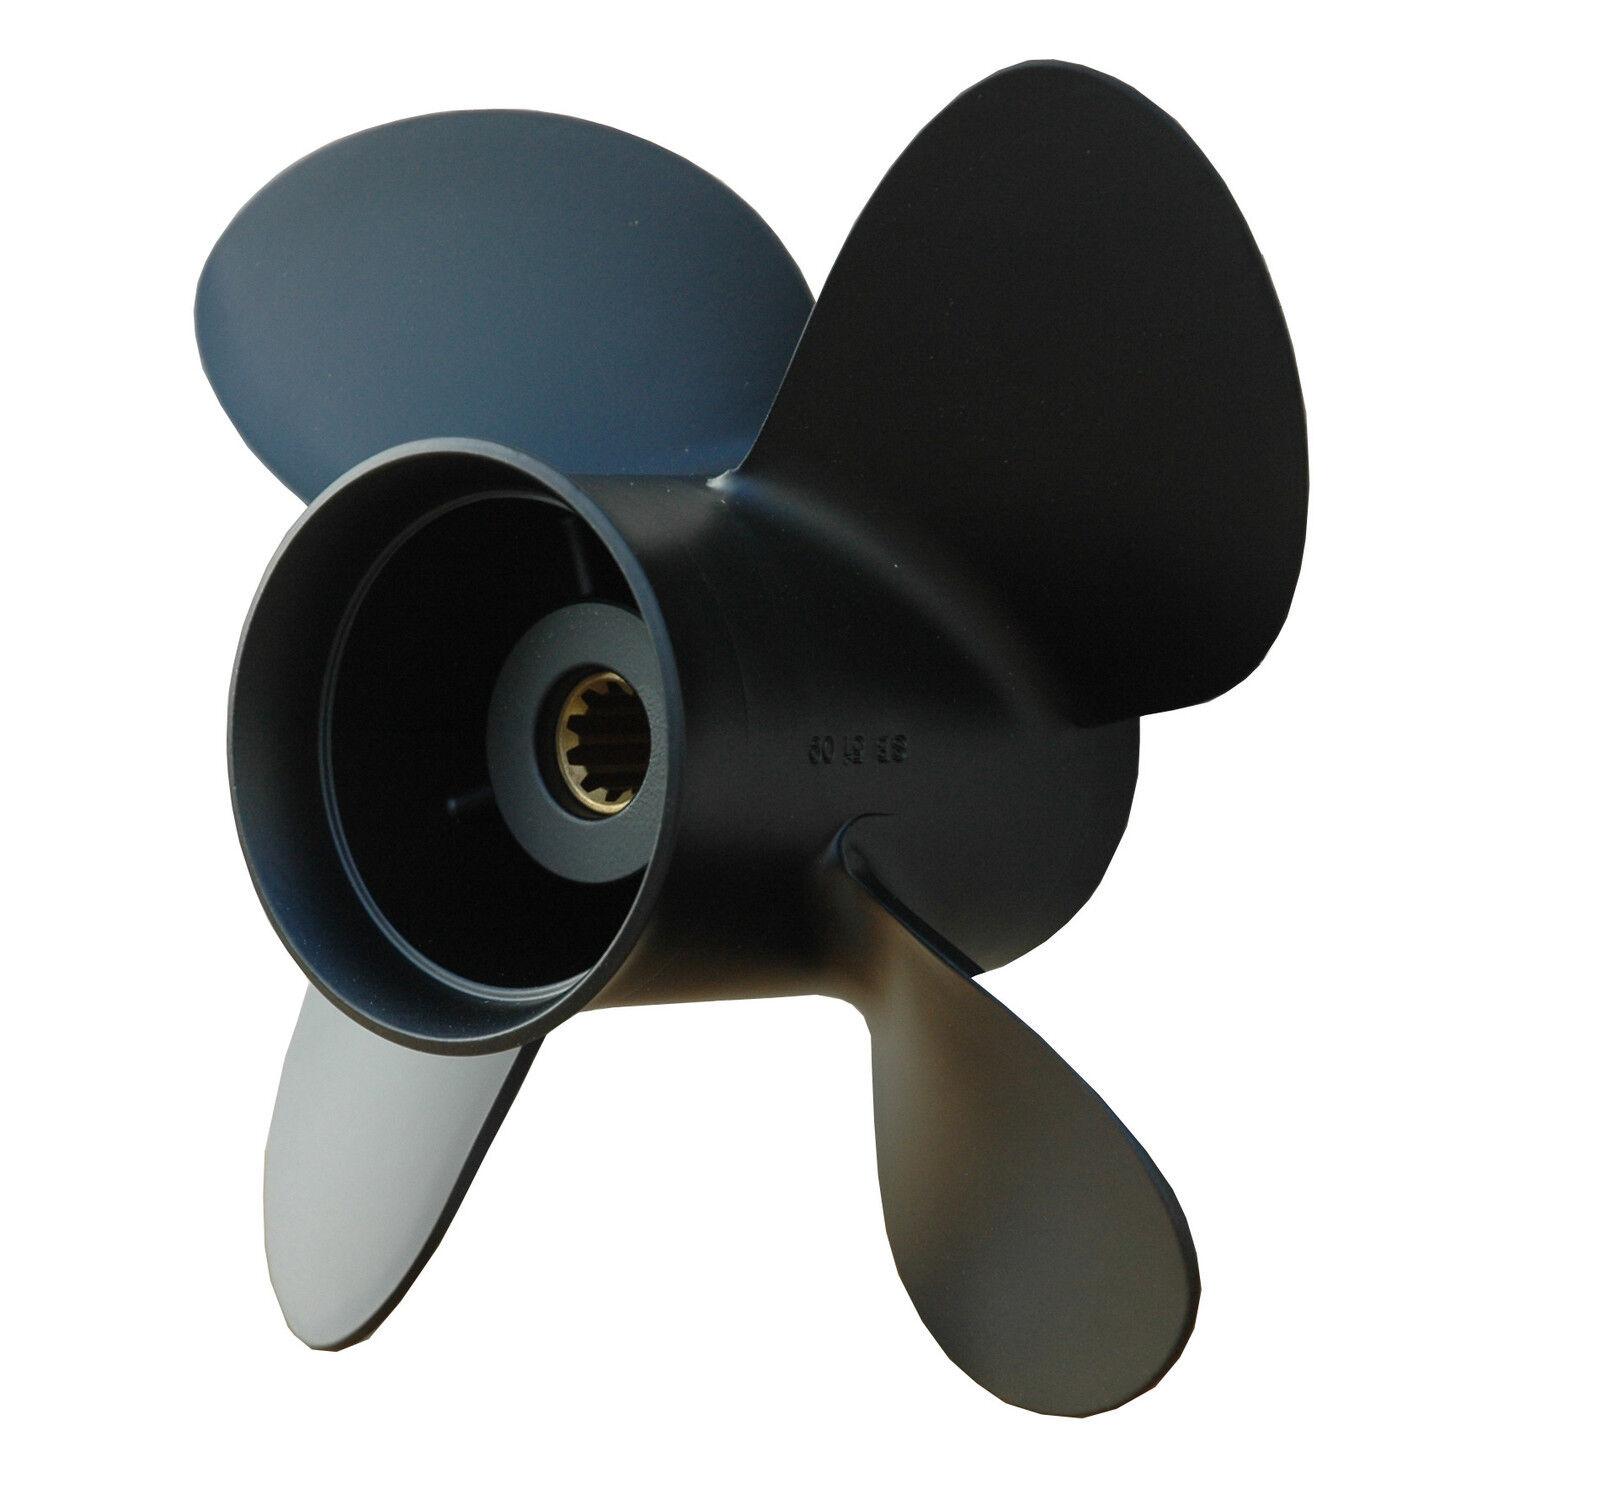 SOLAS Propeller Alu 4 - 10 x 1/5 x 10 11 für Evinrude Johnson 20; 25; 30 & 35 PS 884219